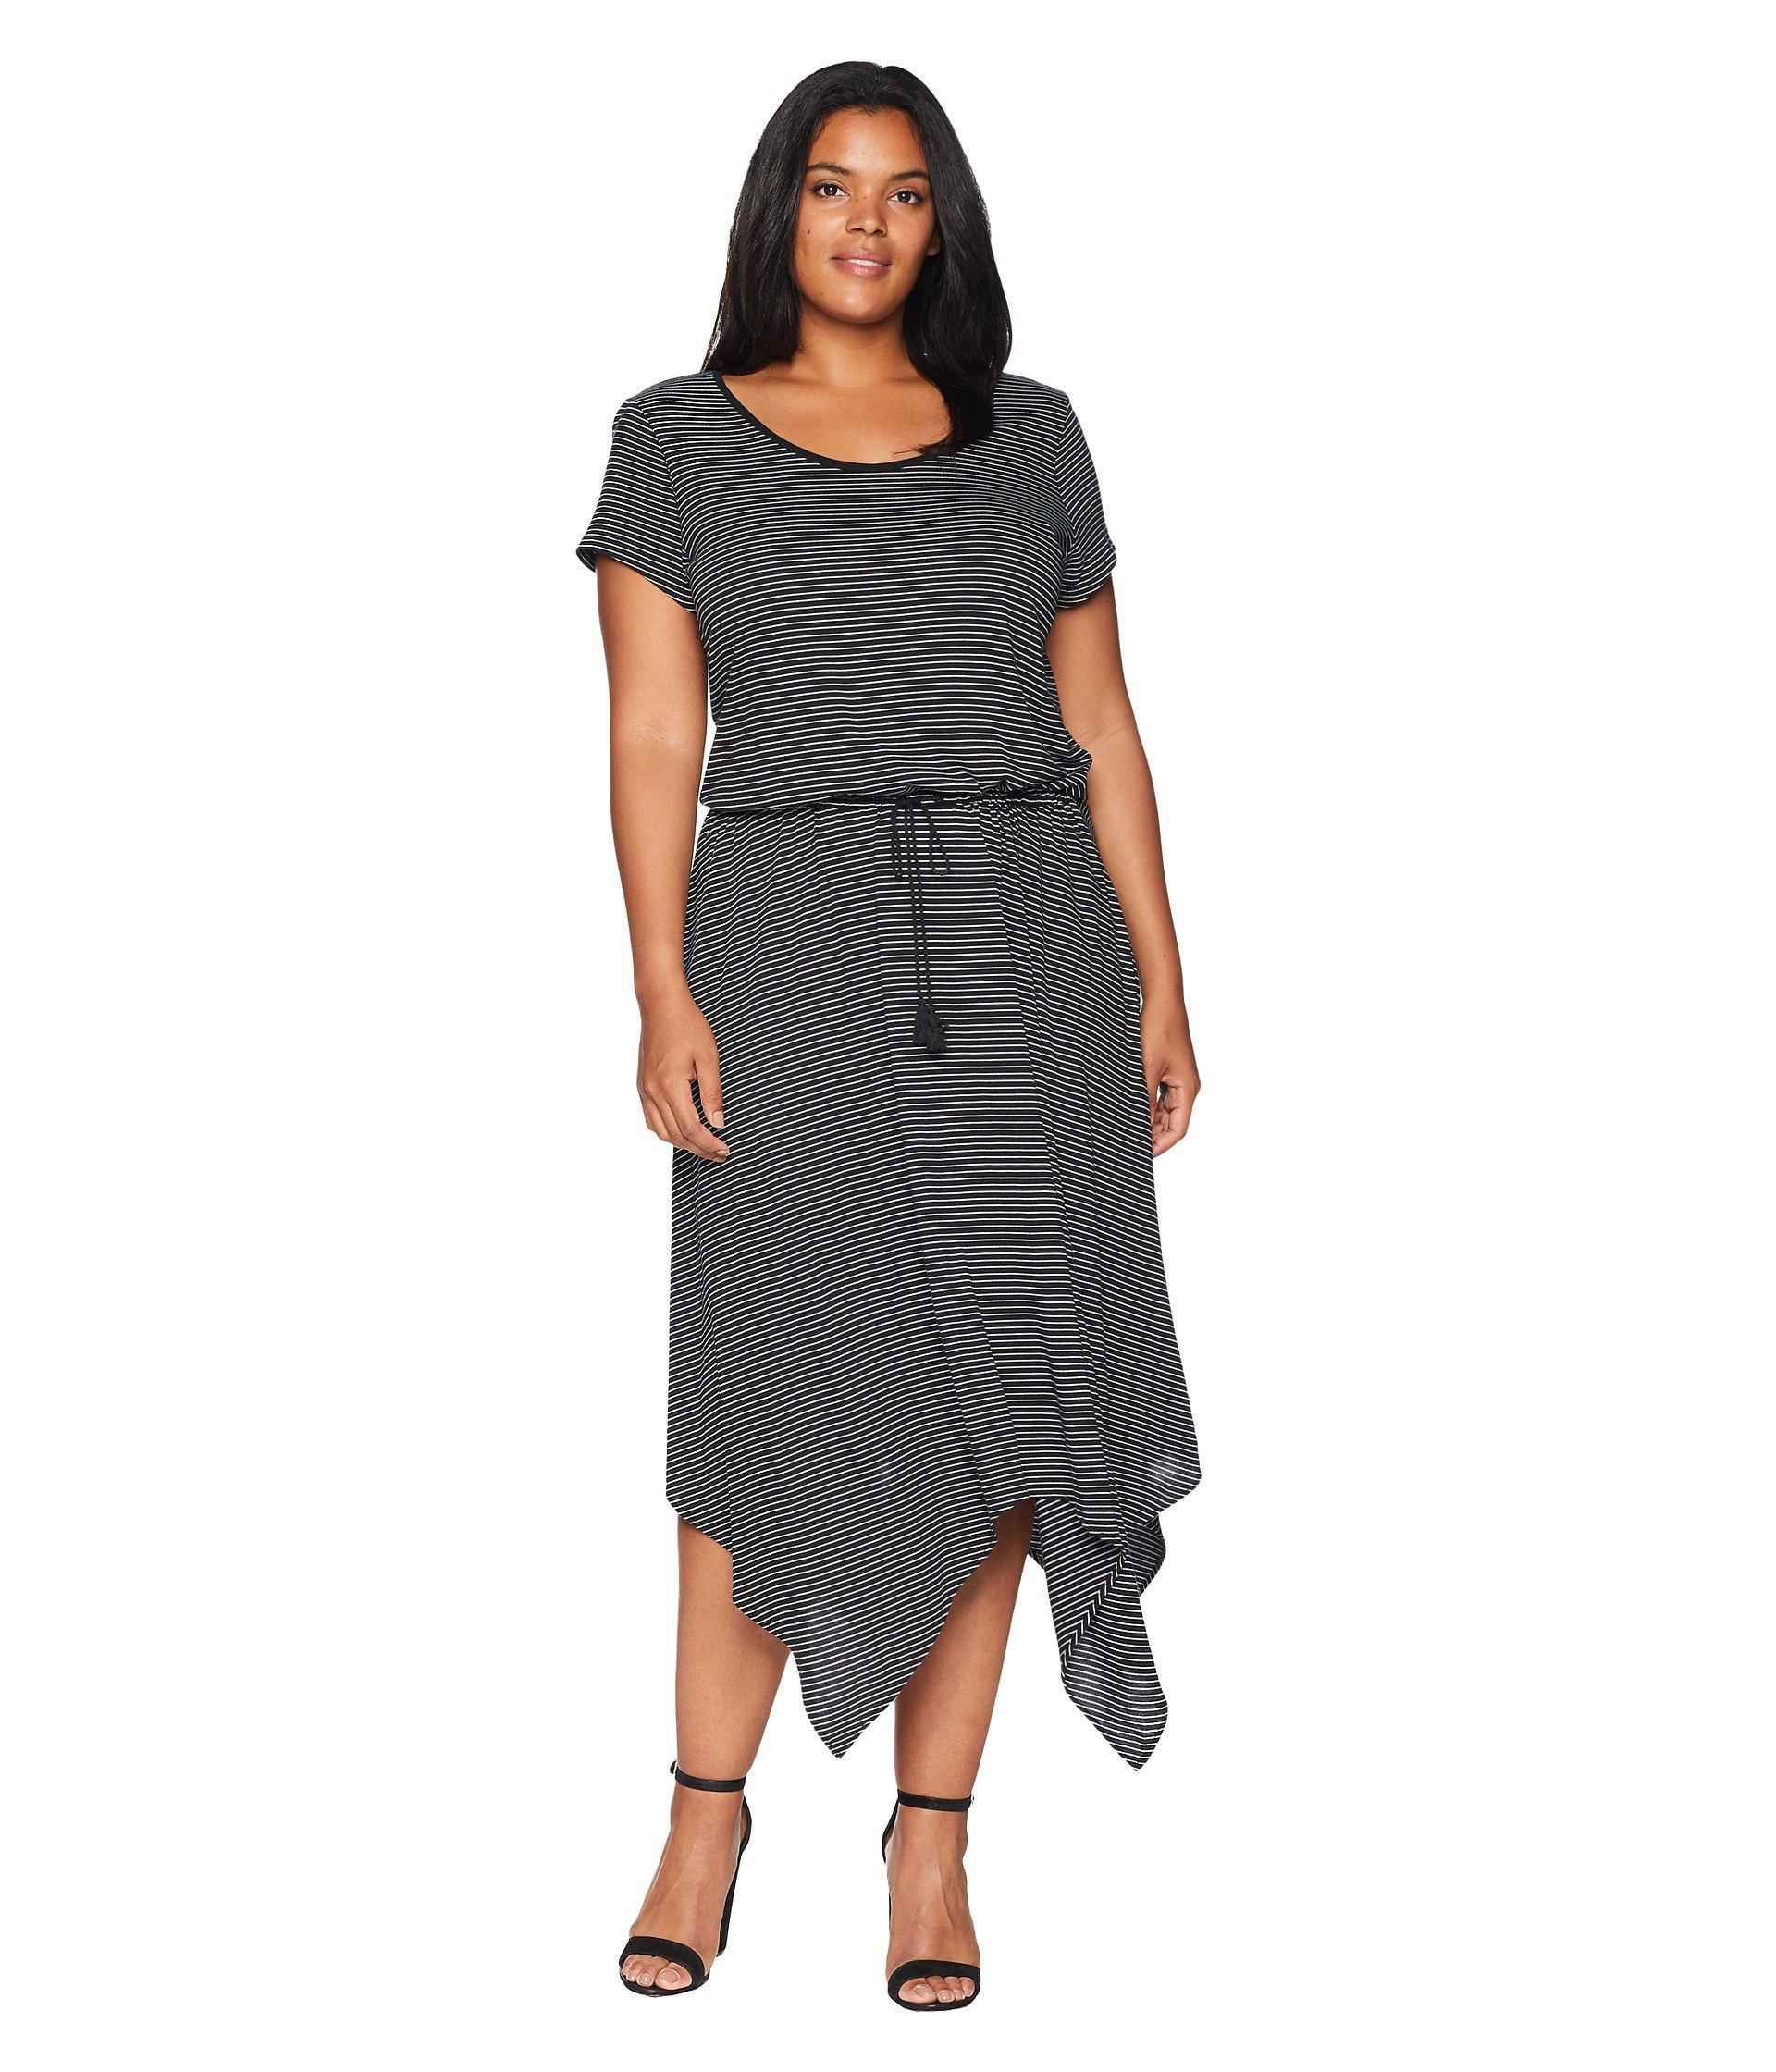 Plus Size Short Sleeve Polo Dress